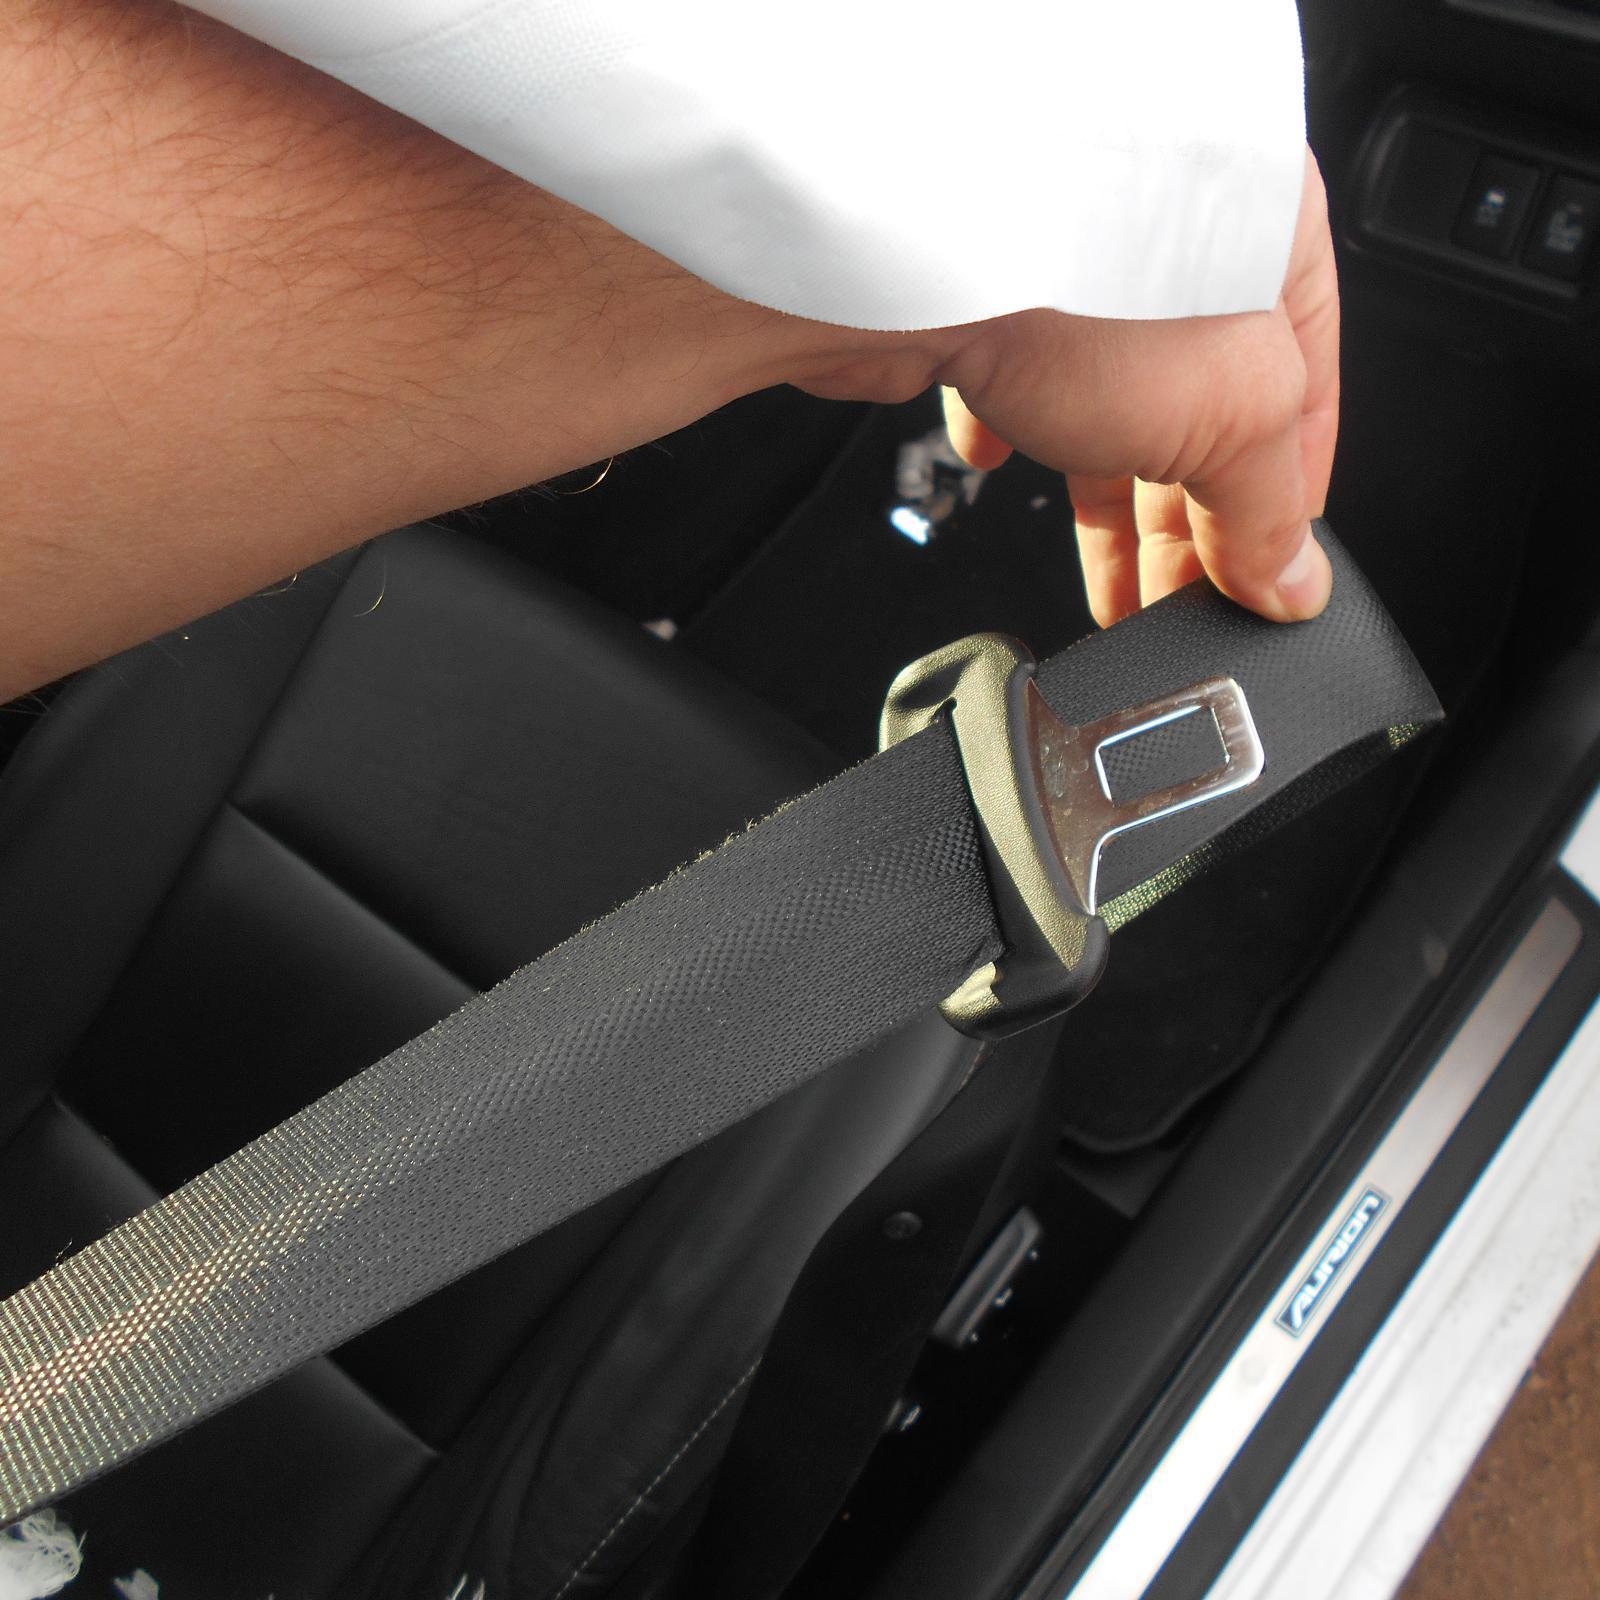 TOYOTA AURION, Seatbelt/Stalk, RH FRONT, SEAT BELT ONLY, GSV50R, 04/12-08/17